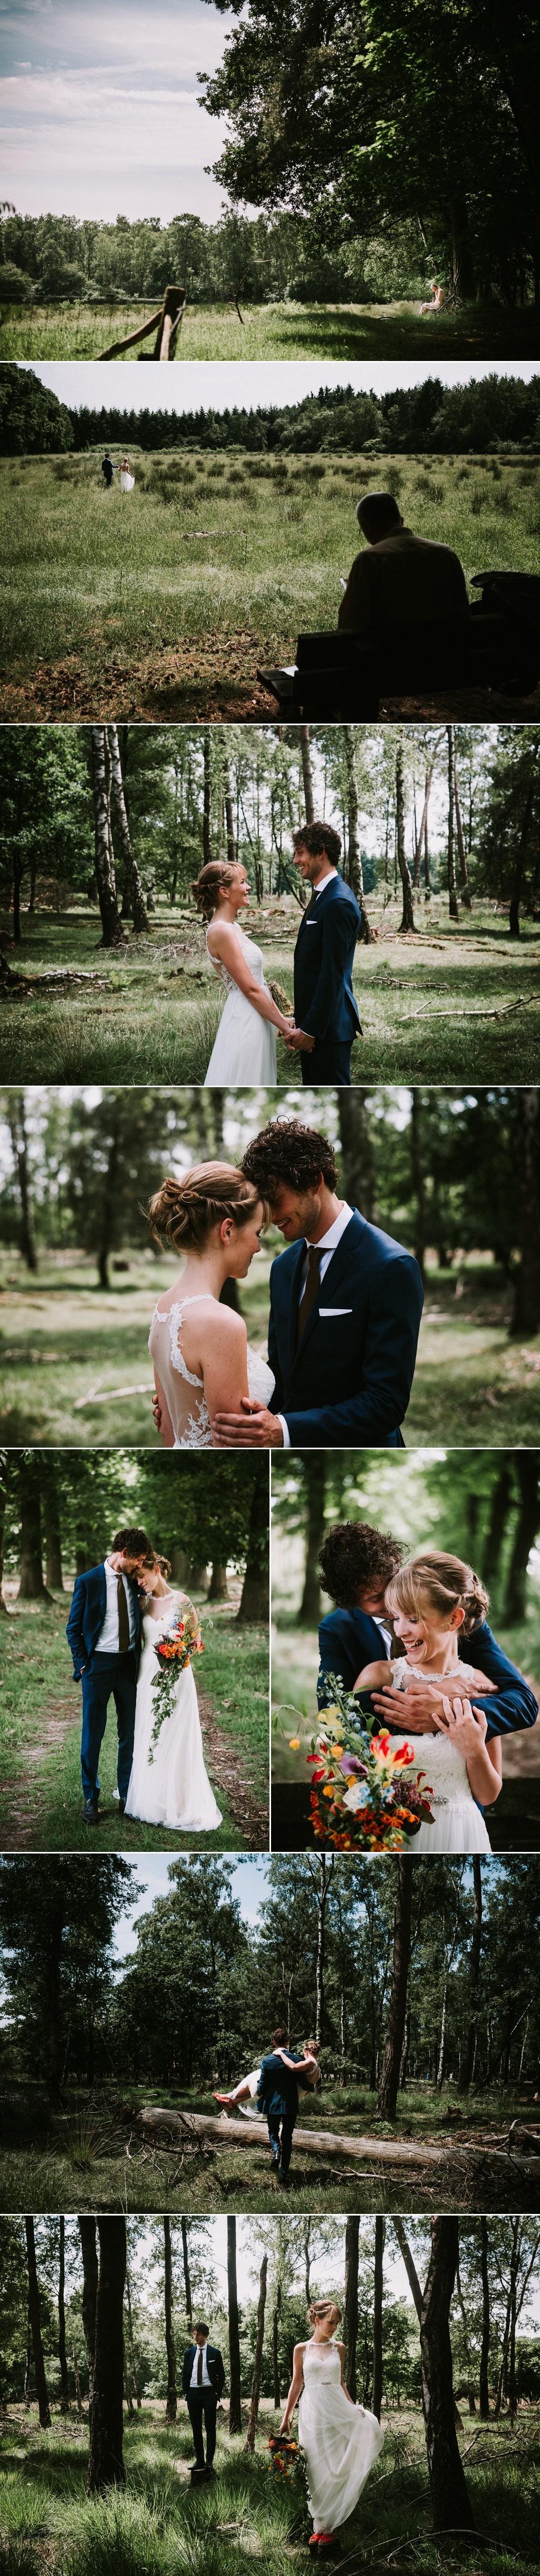 trouwfotograaf-rotterdam-trouwen-in-het-bos-arnhem-fotografie-steef-utama-w-w-04